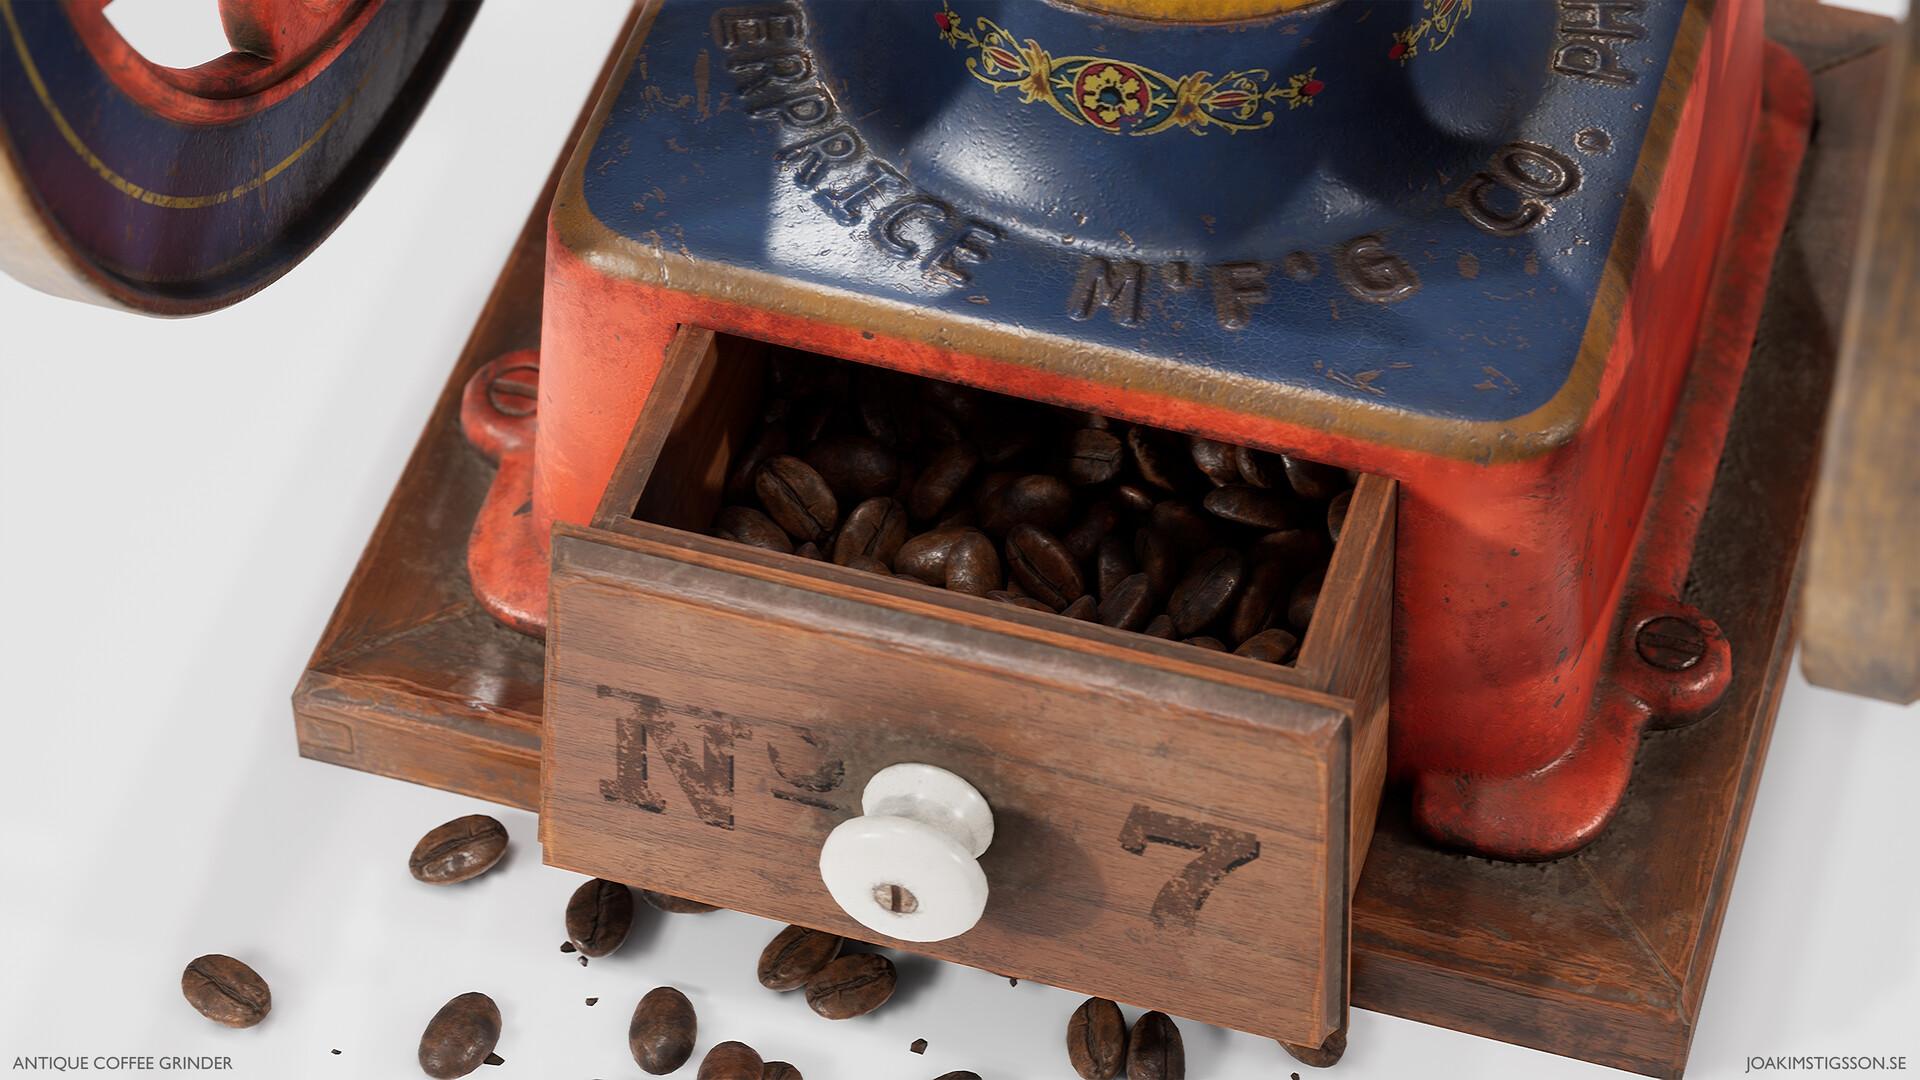 Joakim stigsson coffeegrinderrender 02